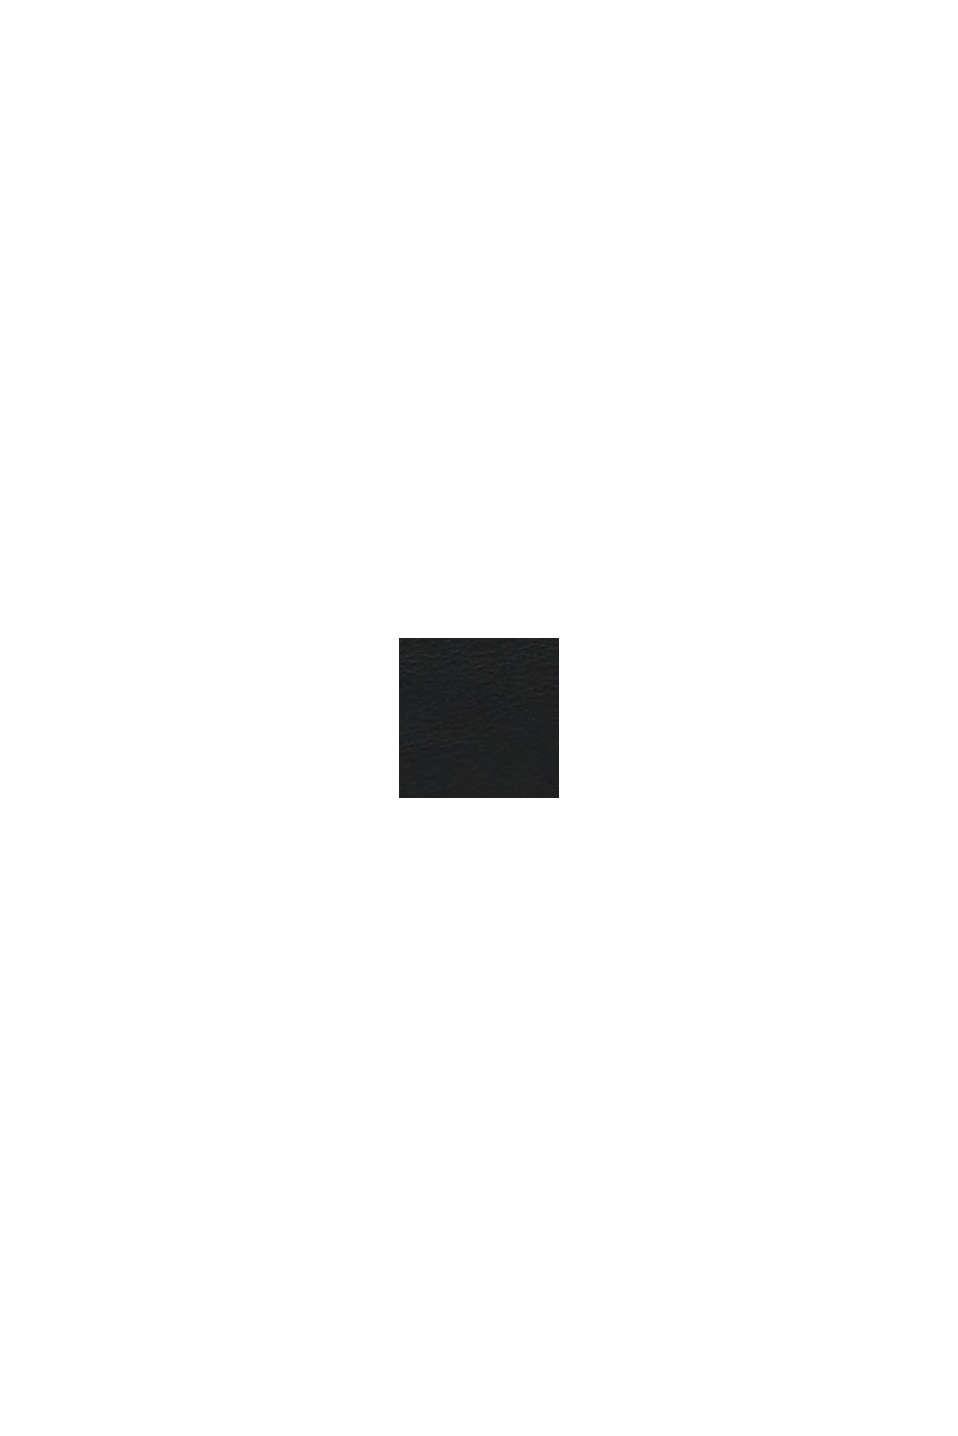 Vegansk: Shoppingväska i skinnlook, BLACK, swatch